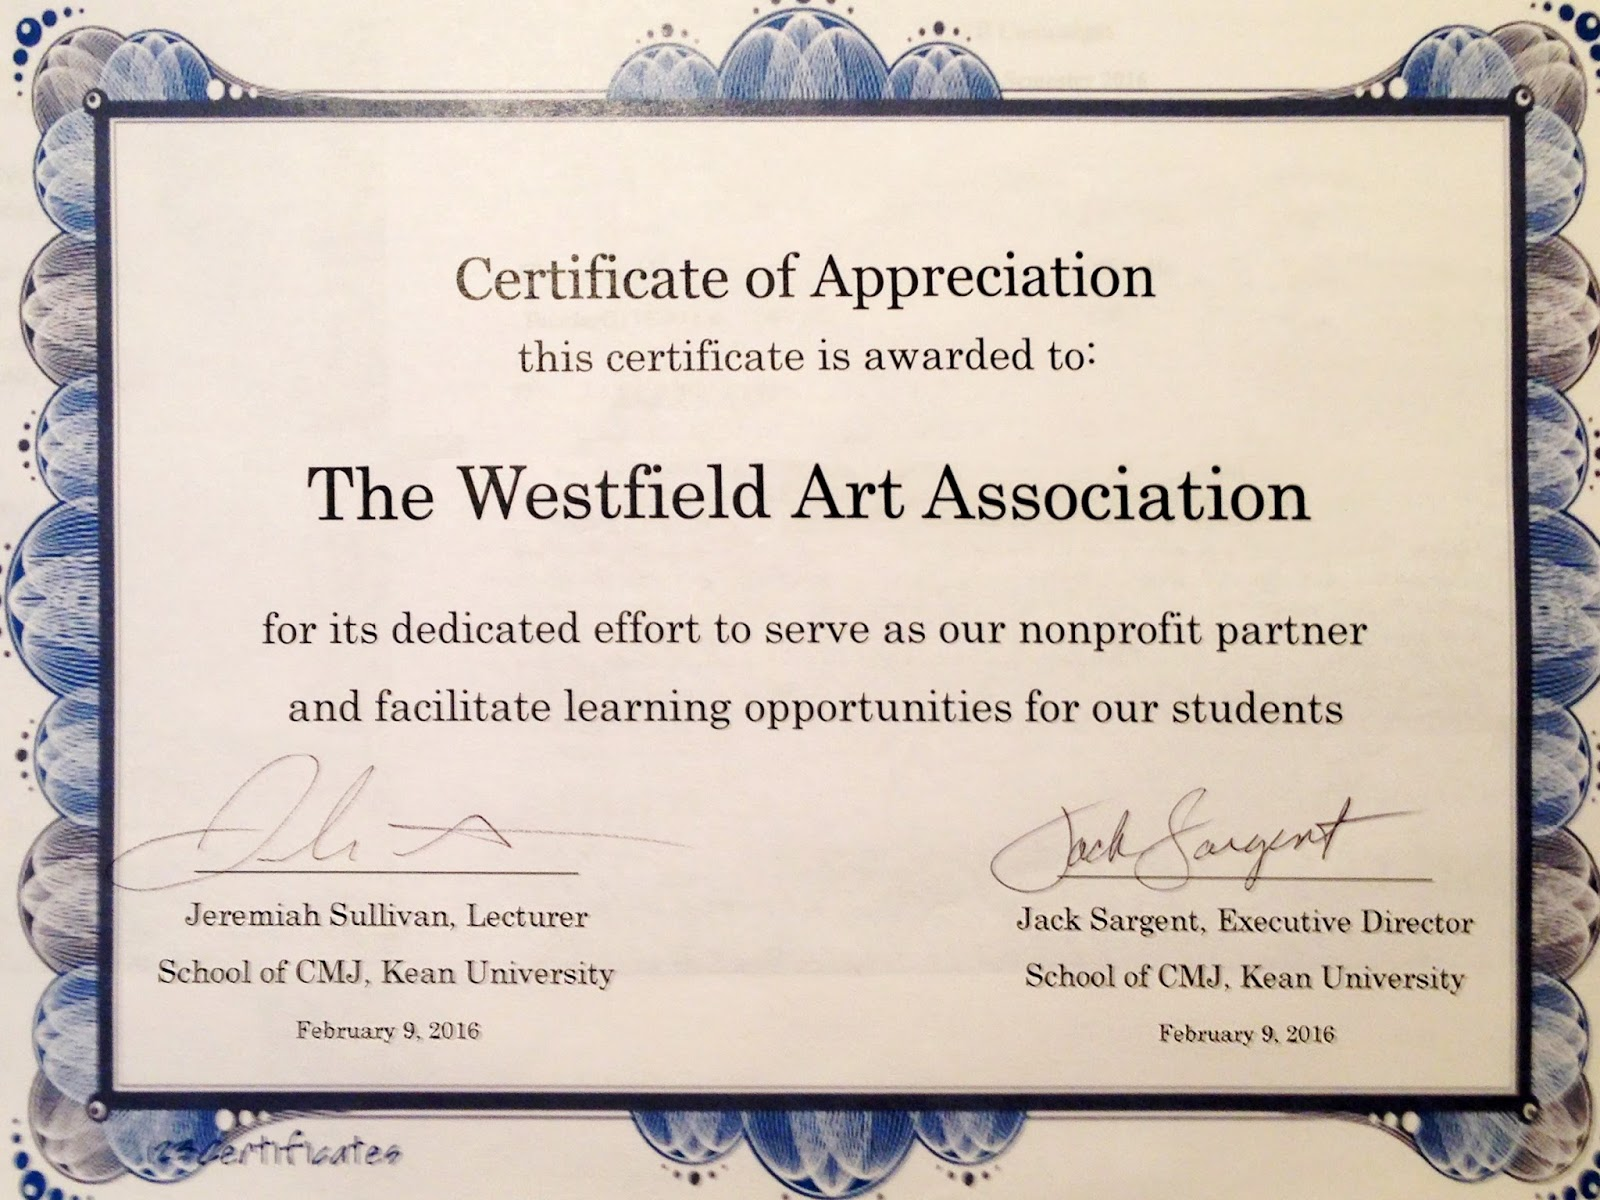 Kean University Academic Calendar.A New Partnership With Kean University Westfield Art Association